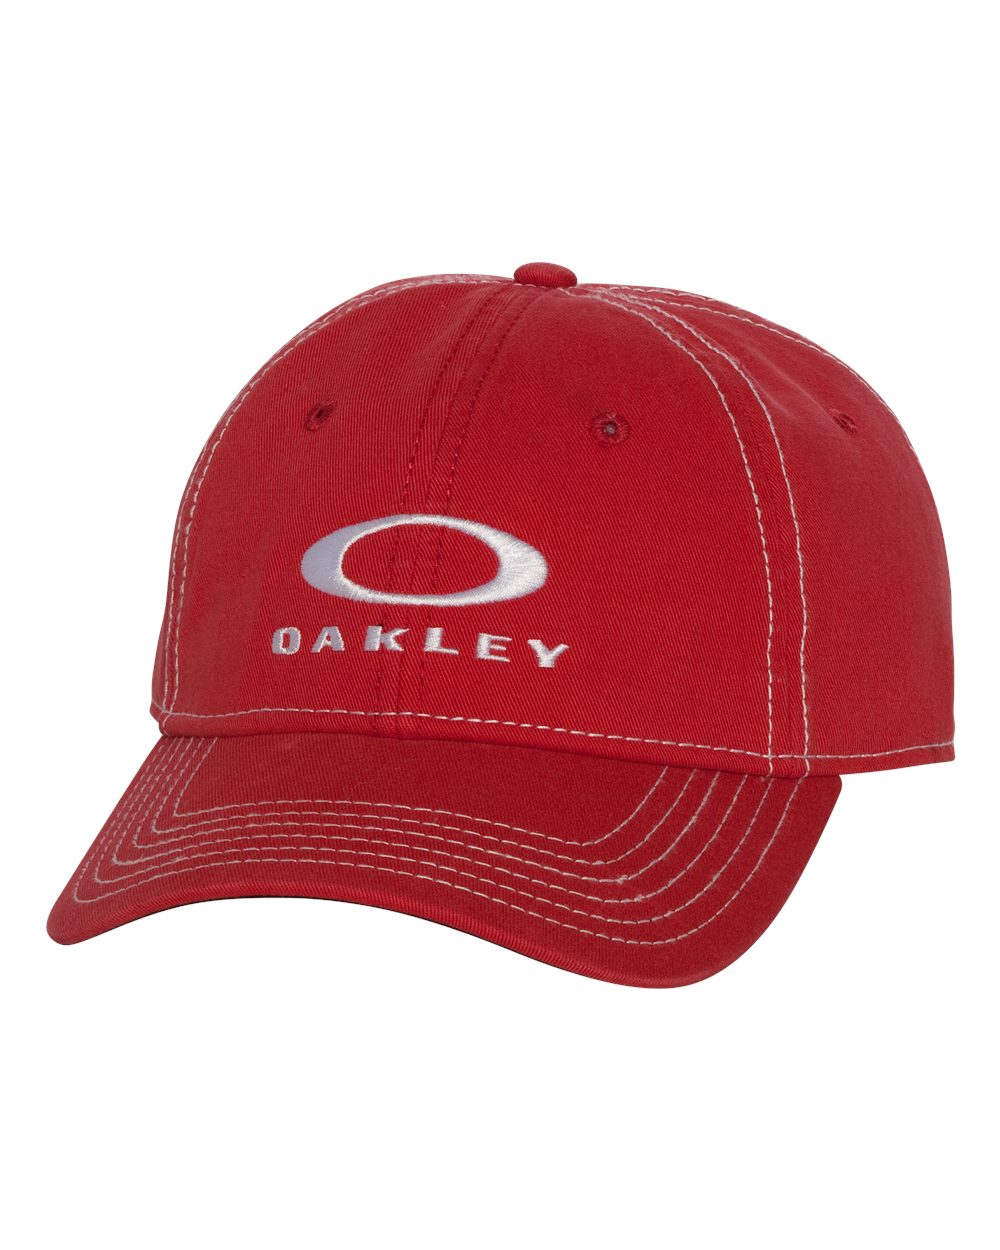 Oakley TP3 Cap. 91928. Logo Shirts Direct 9a55eb360b87